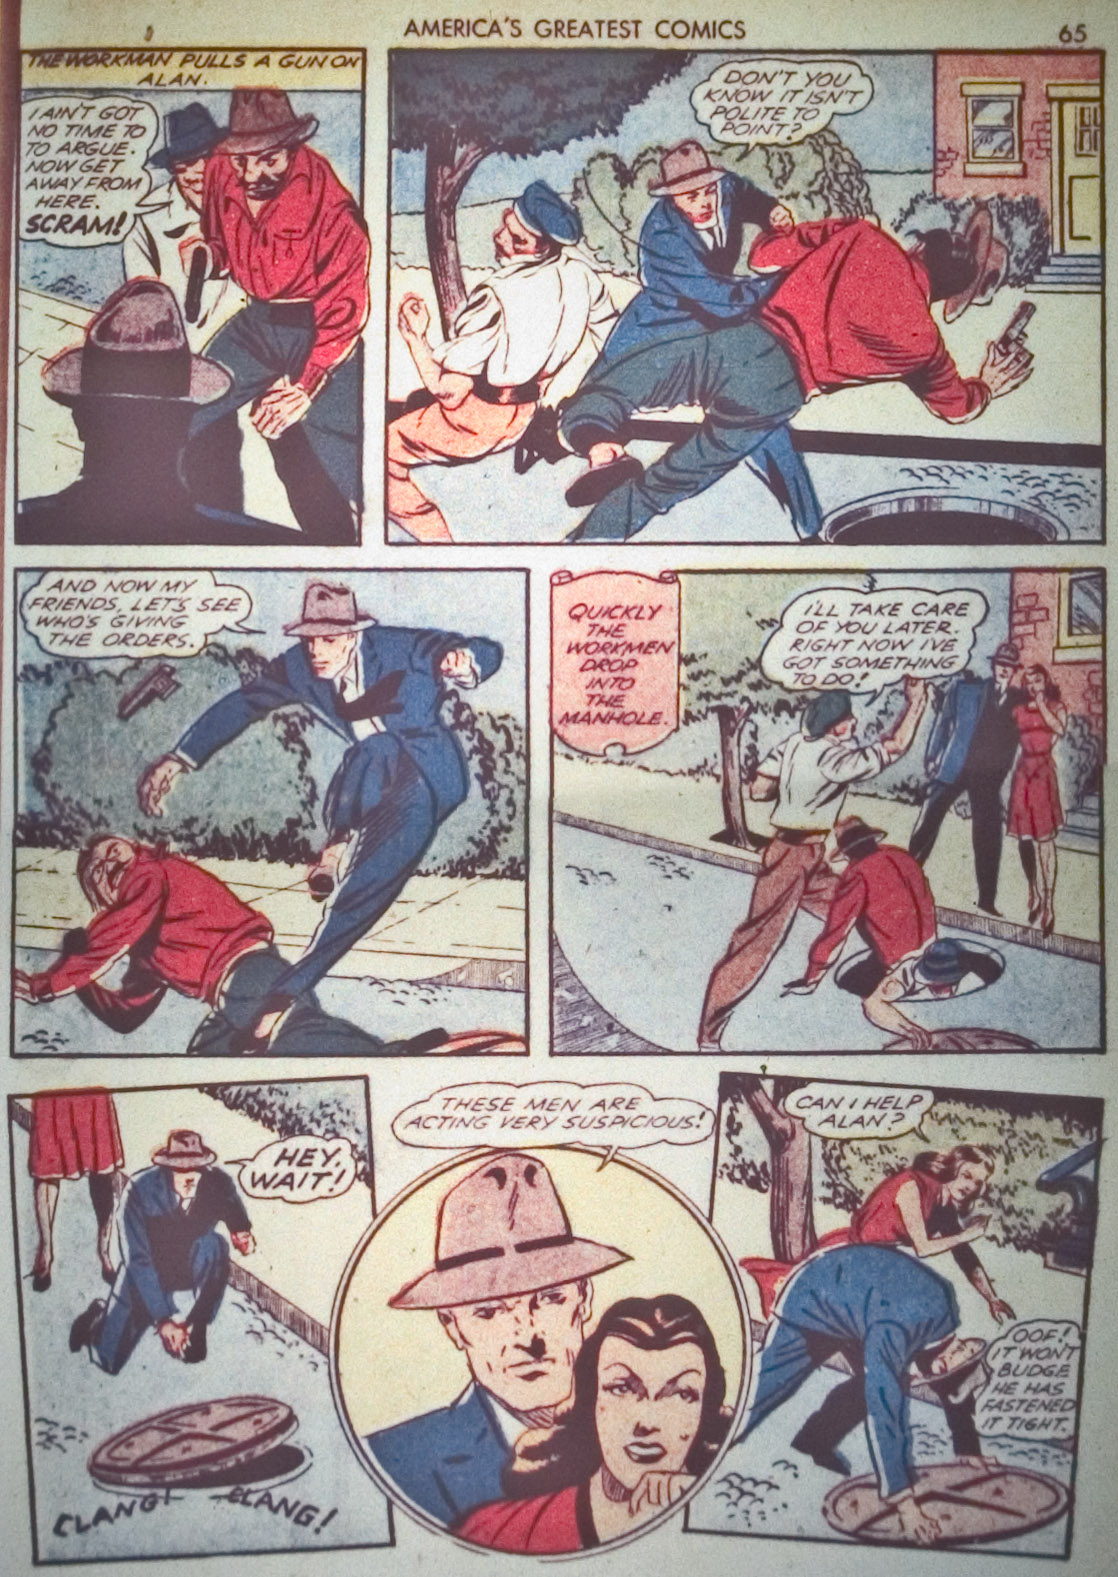 Read online America's Greatest Comics comic -  Issue #1 - 68